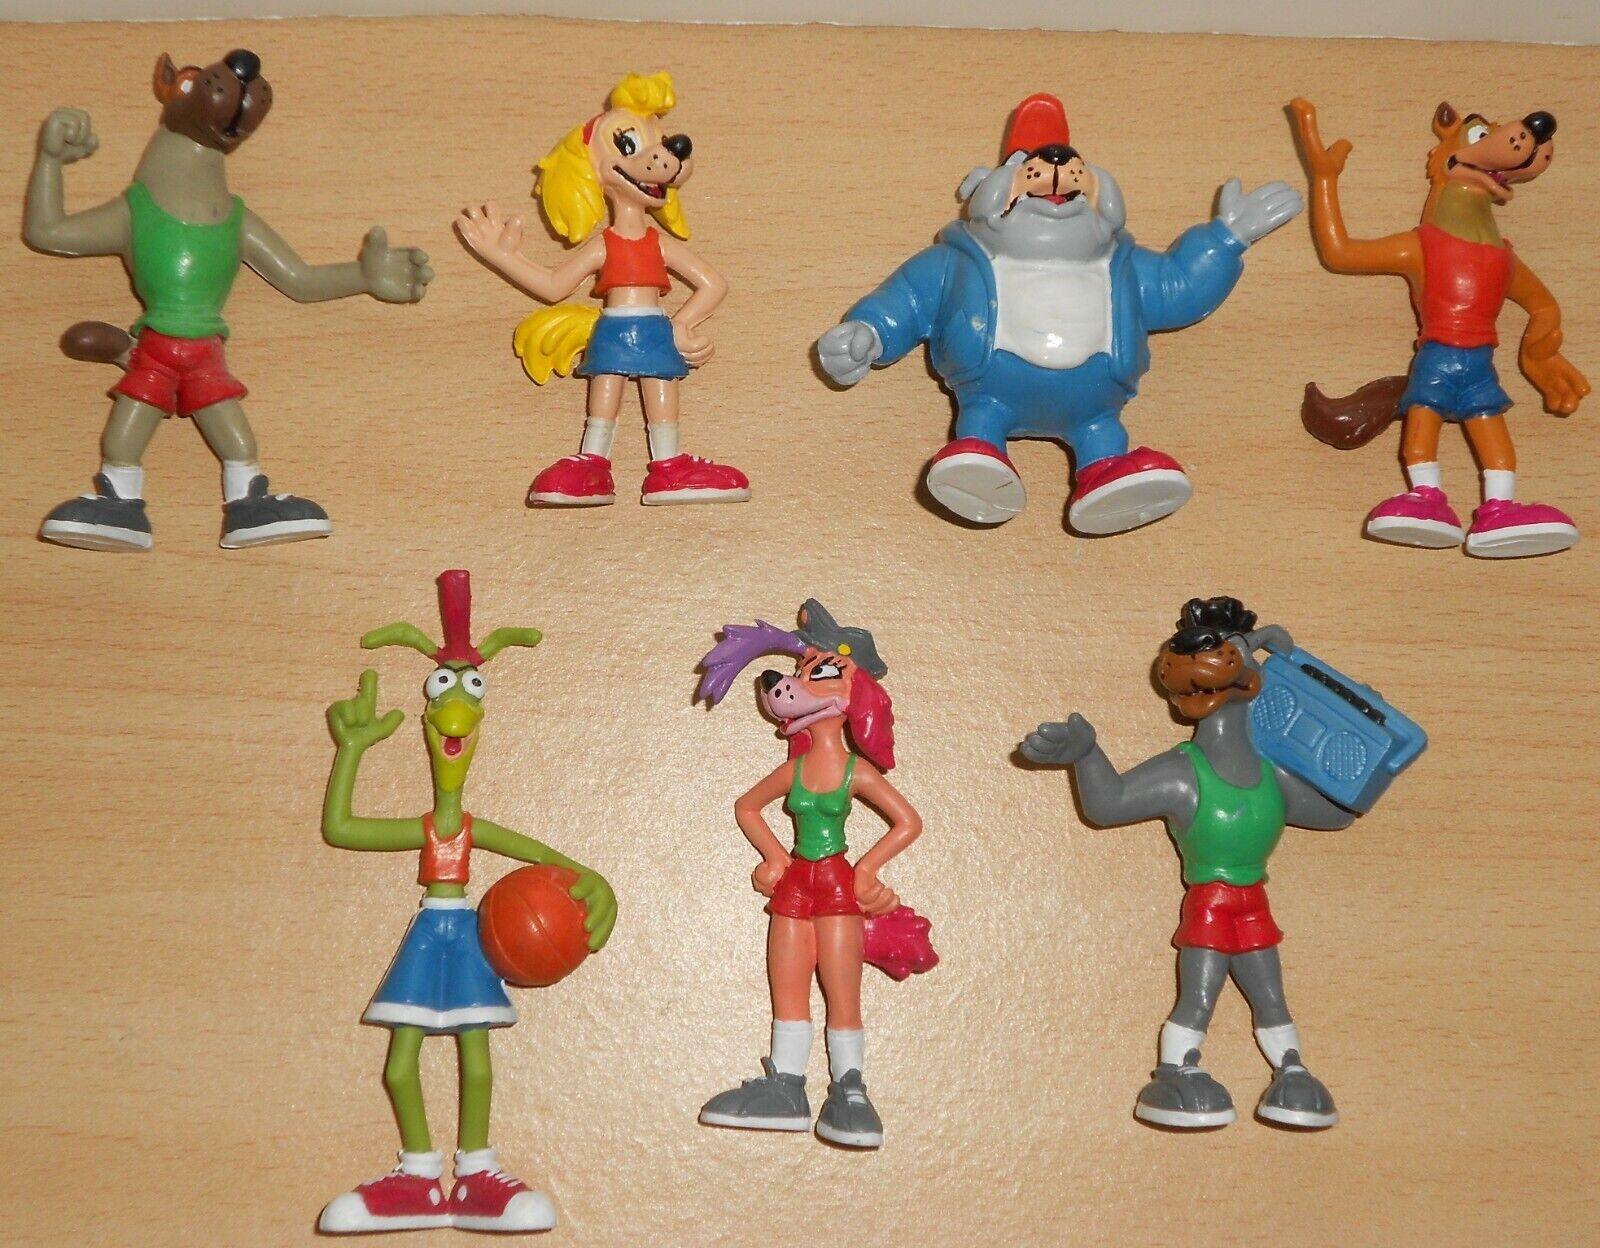 Película de la fiebre Cesta Set Completo Figura Estatuilla Baloncesto NBA década de 1980